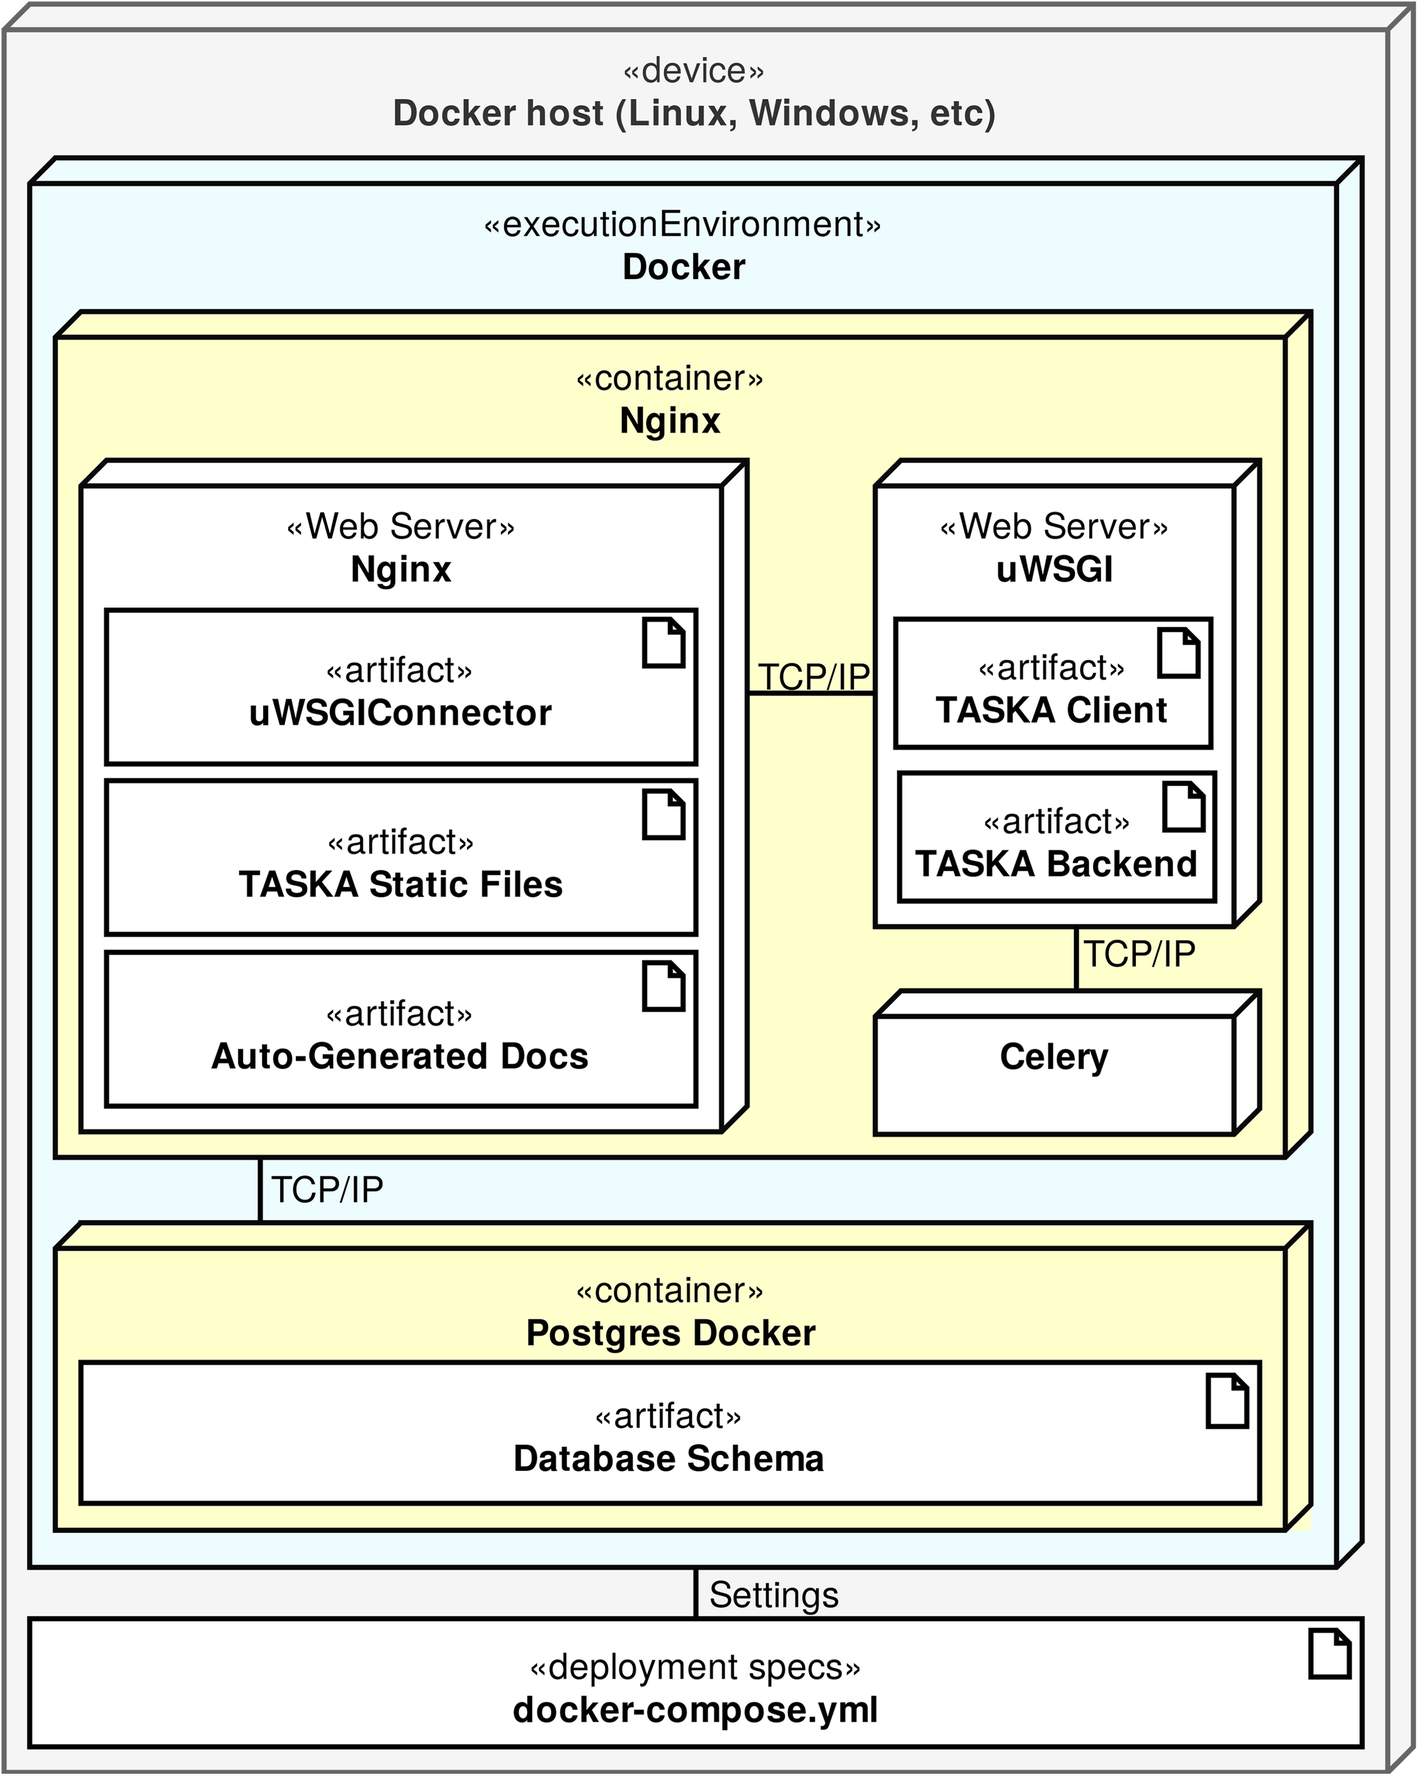 TASKA: A modular task management system to support health